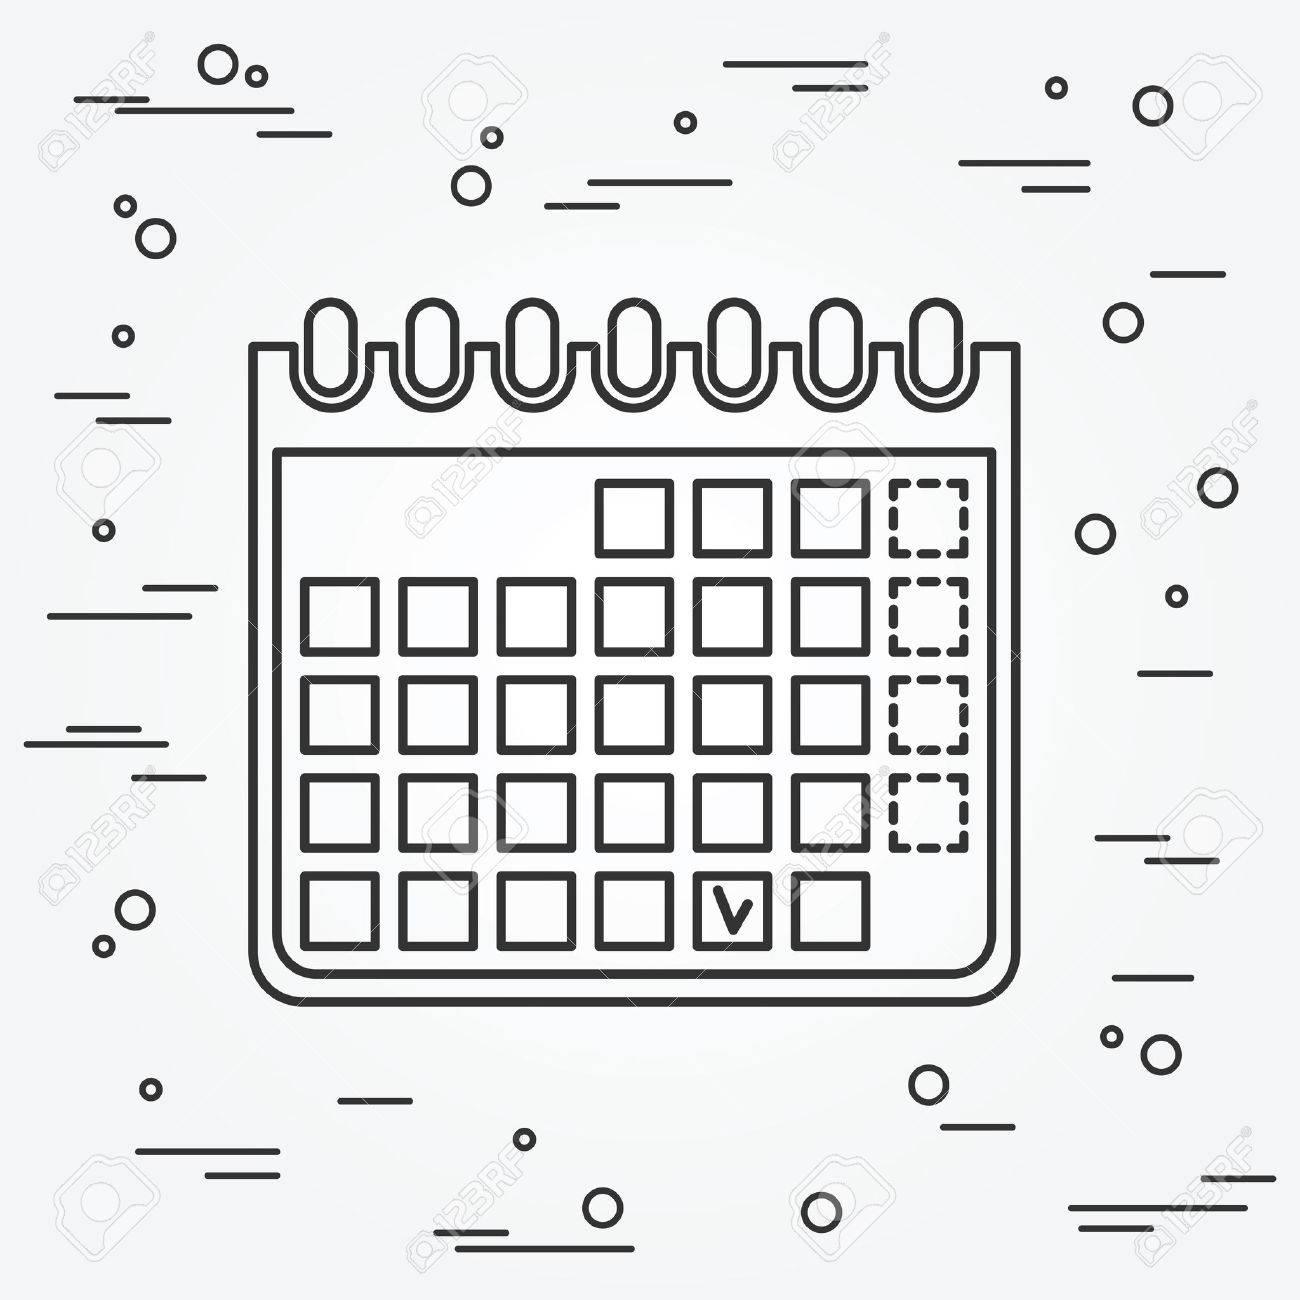 Calendar Icon. Calendar Icon .Calendar Icon Drawing. Calendar Icon Image. Calendar Icon Graphic. Calendar Icon Art. - 48820546